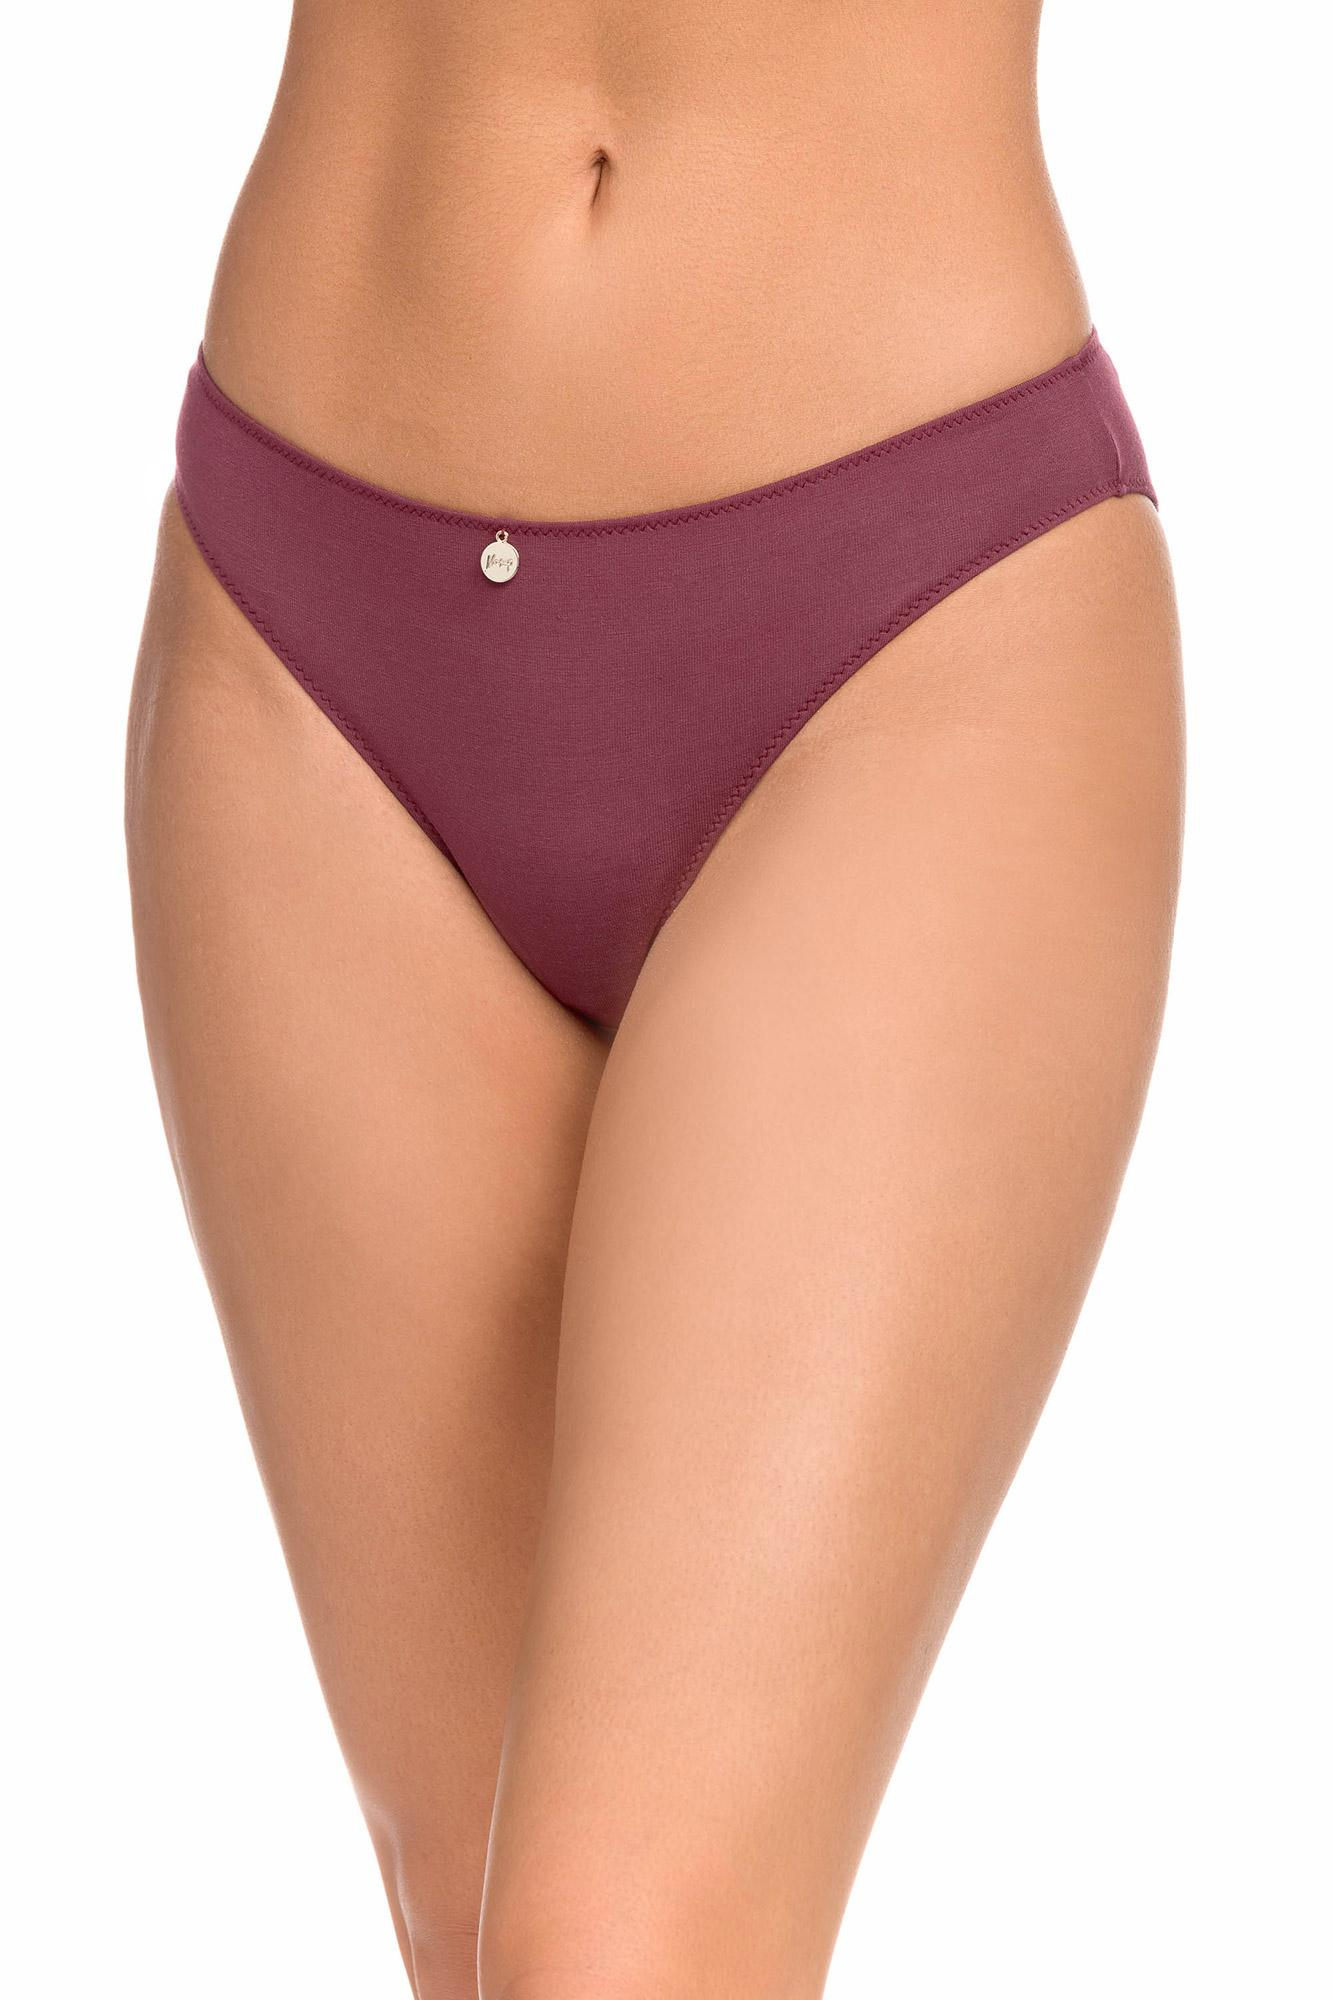 Vamp - Pohodlné jednobarevné dámské kalhotky RED PORTO XL 15830 - Vamp